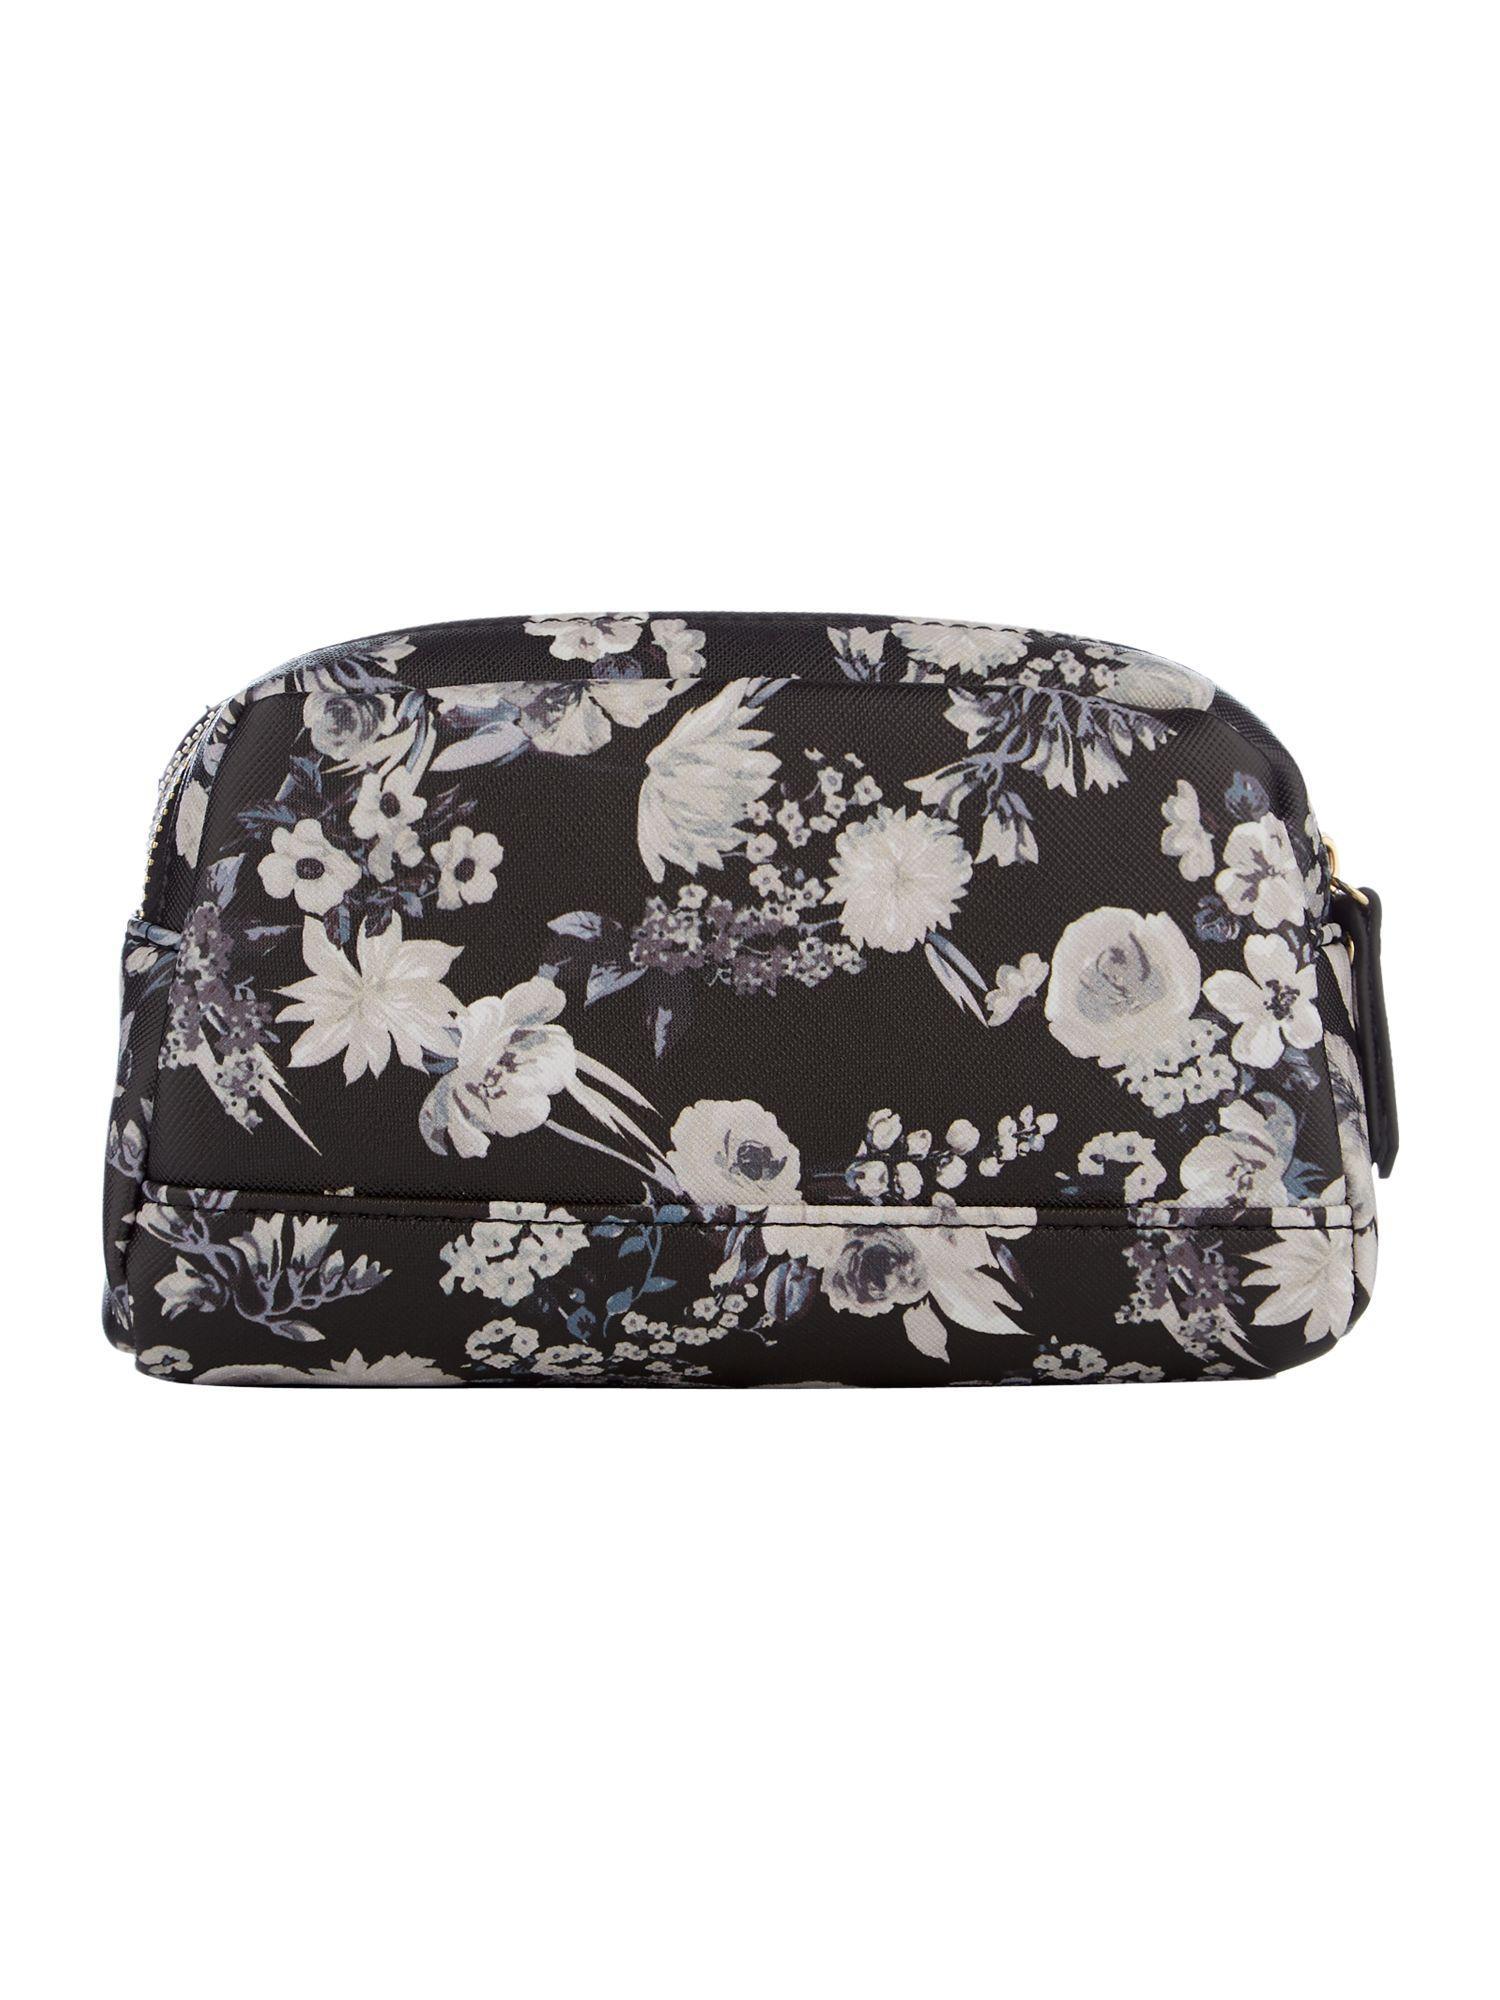 Lyst - Guess Isabeau Floral Double Zip Cos Bag